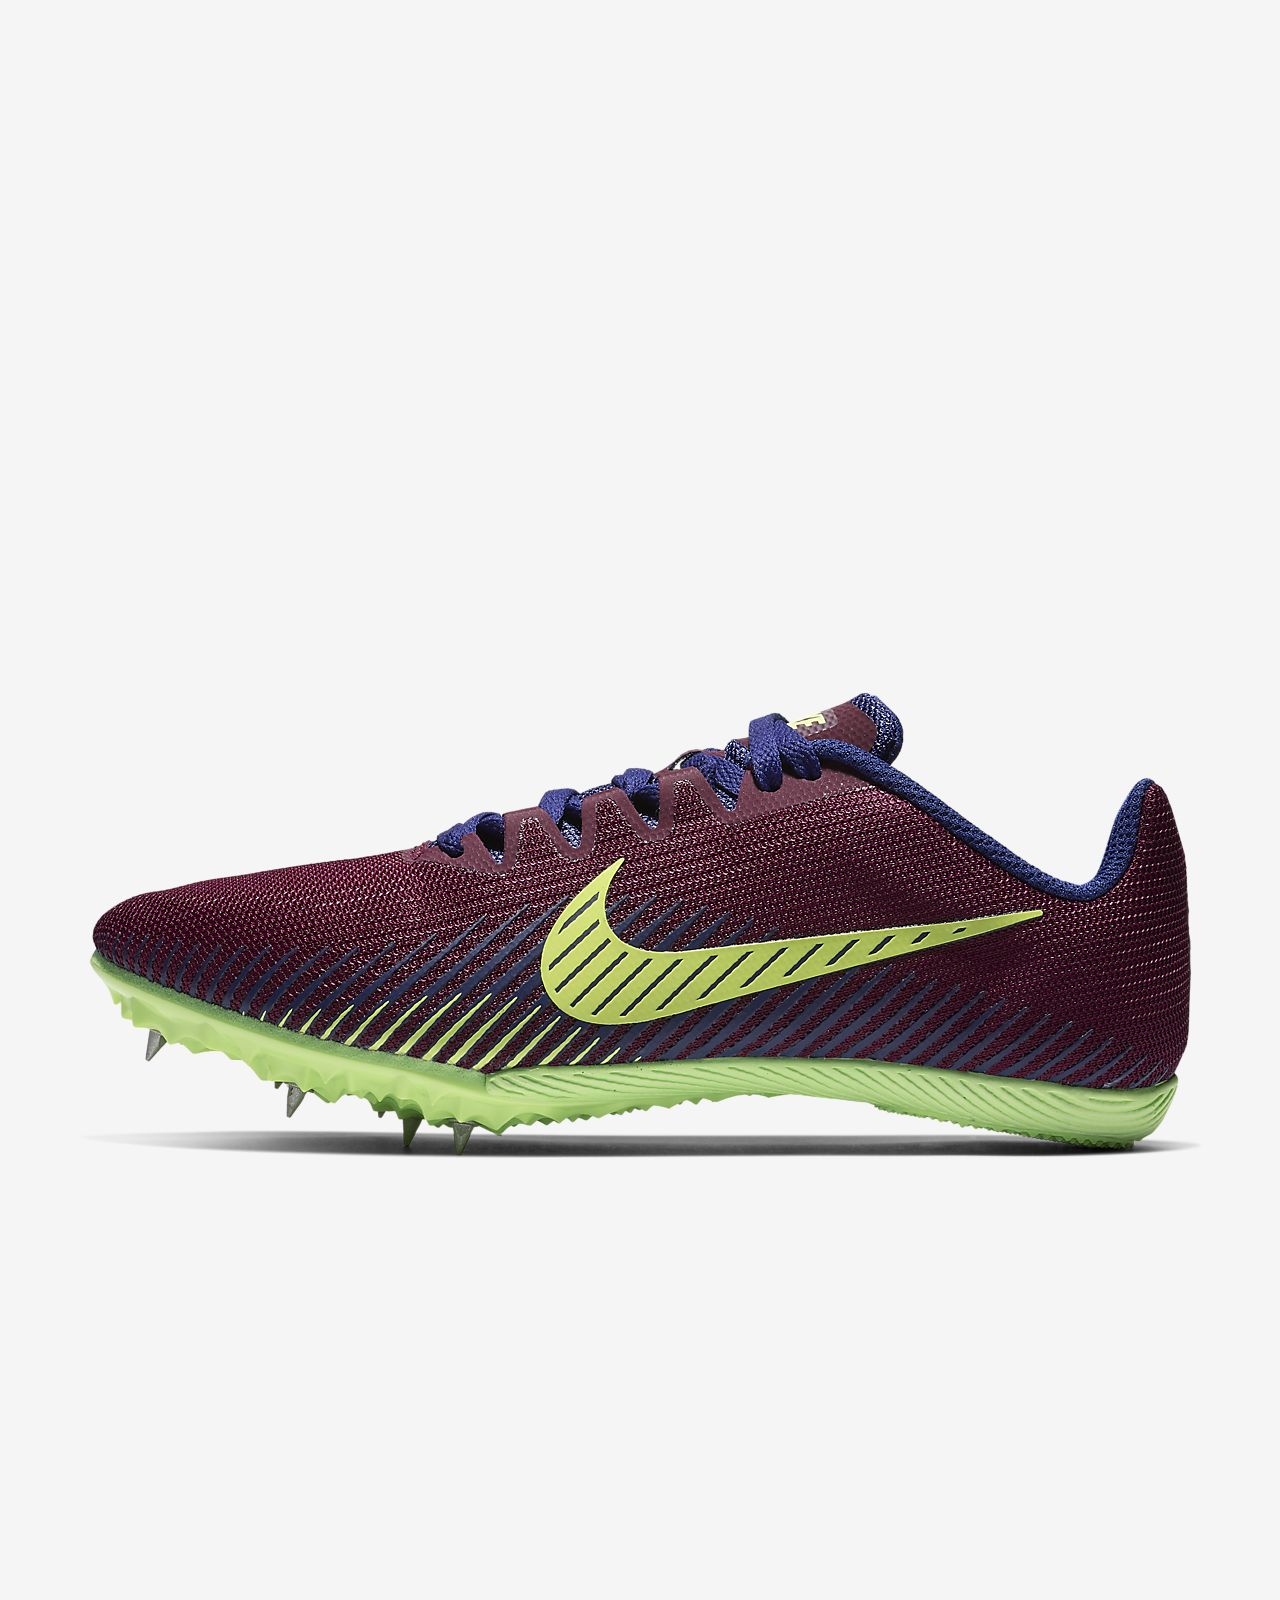 Nike Zoom Rival M 9 Women's Track Spike